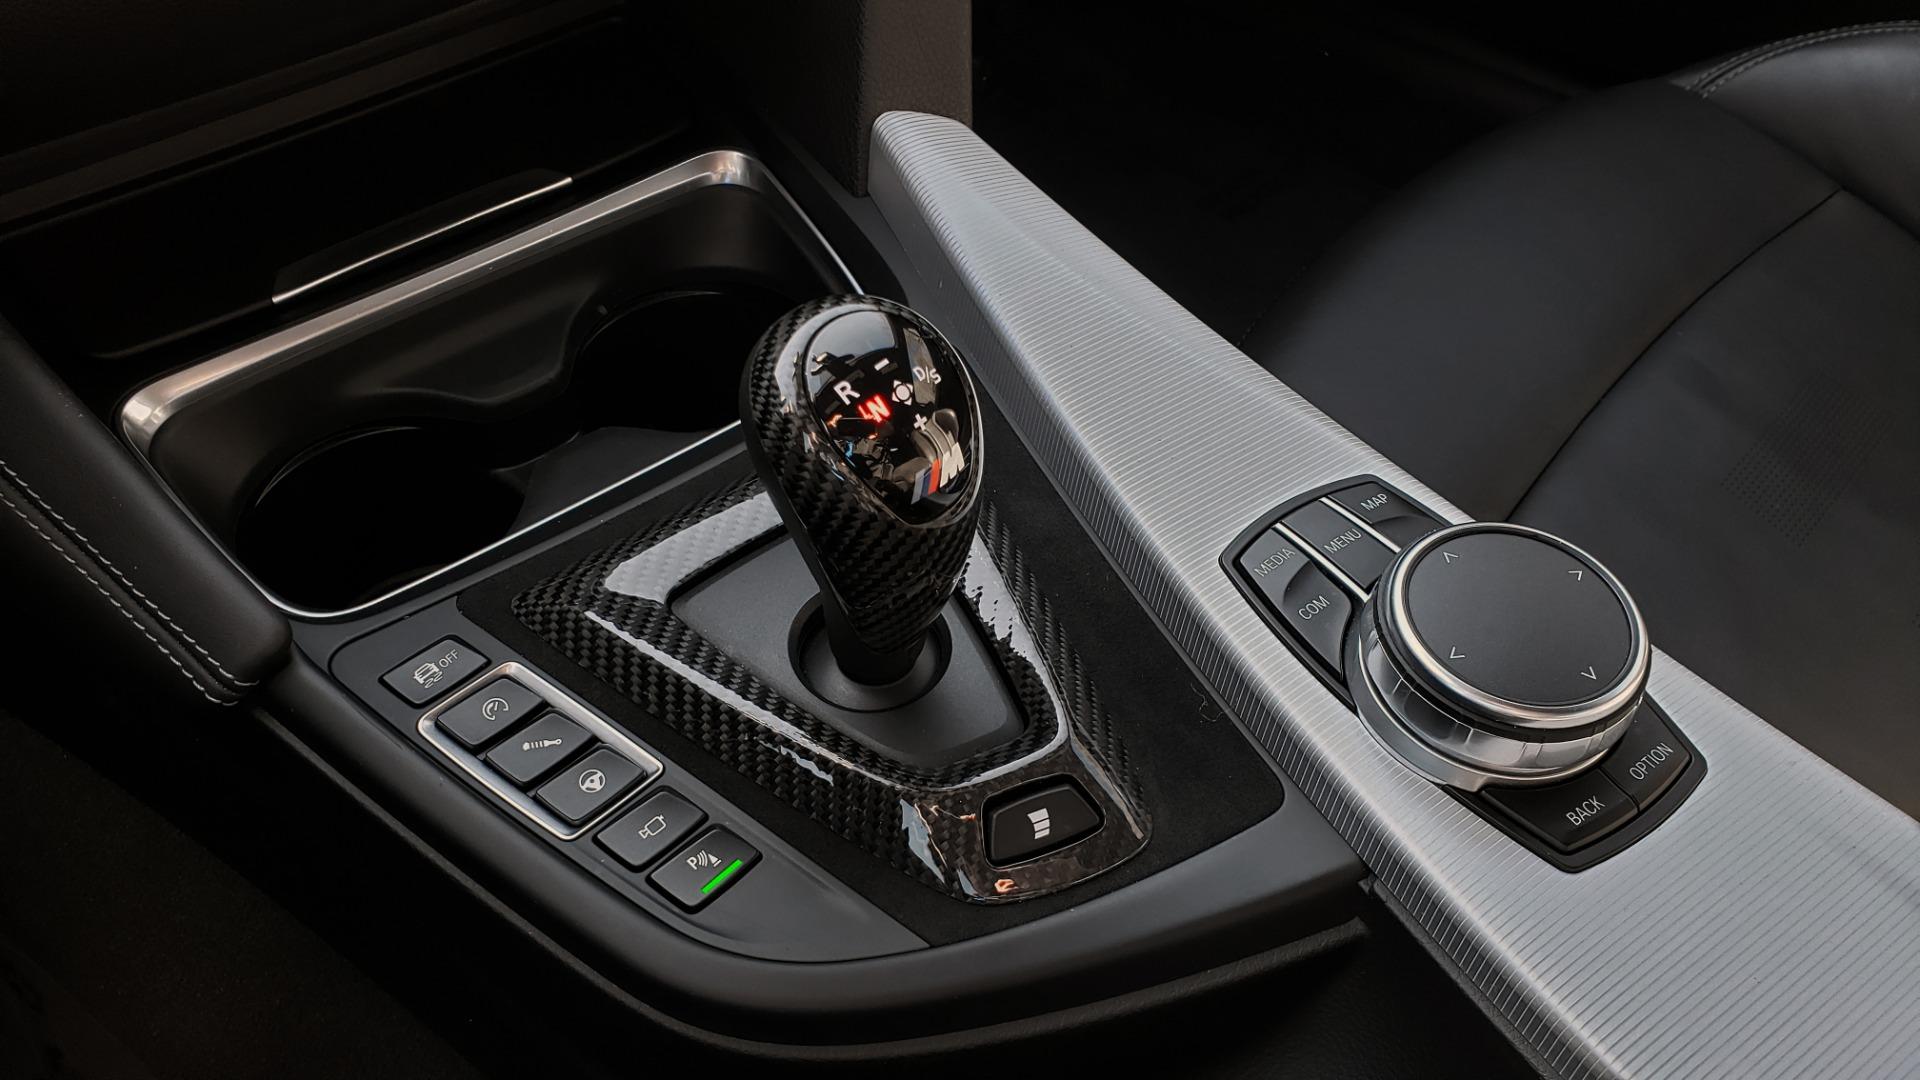 Used 2018 BMW M4 COMP PKG / EXEC / M-DRIVER / PARK CNTRL / ACTIVE BLIND SPOT for sale Sold at Formula Imports in Charlotte NC 28227 52